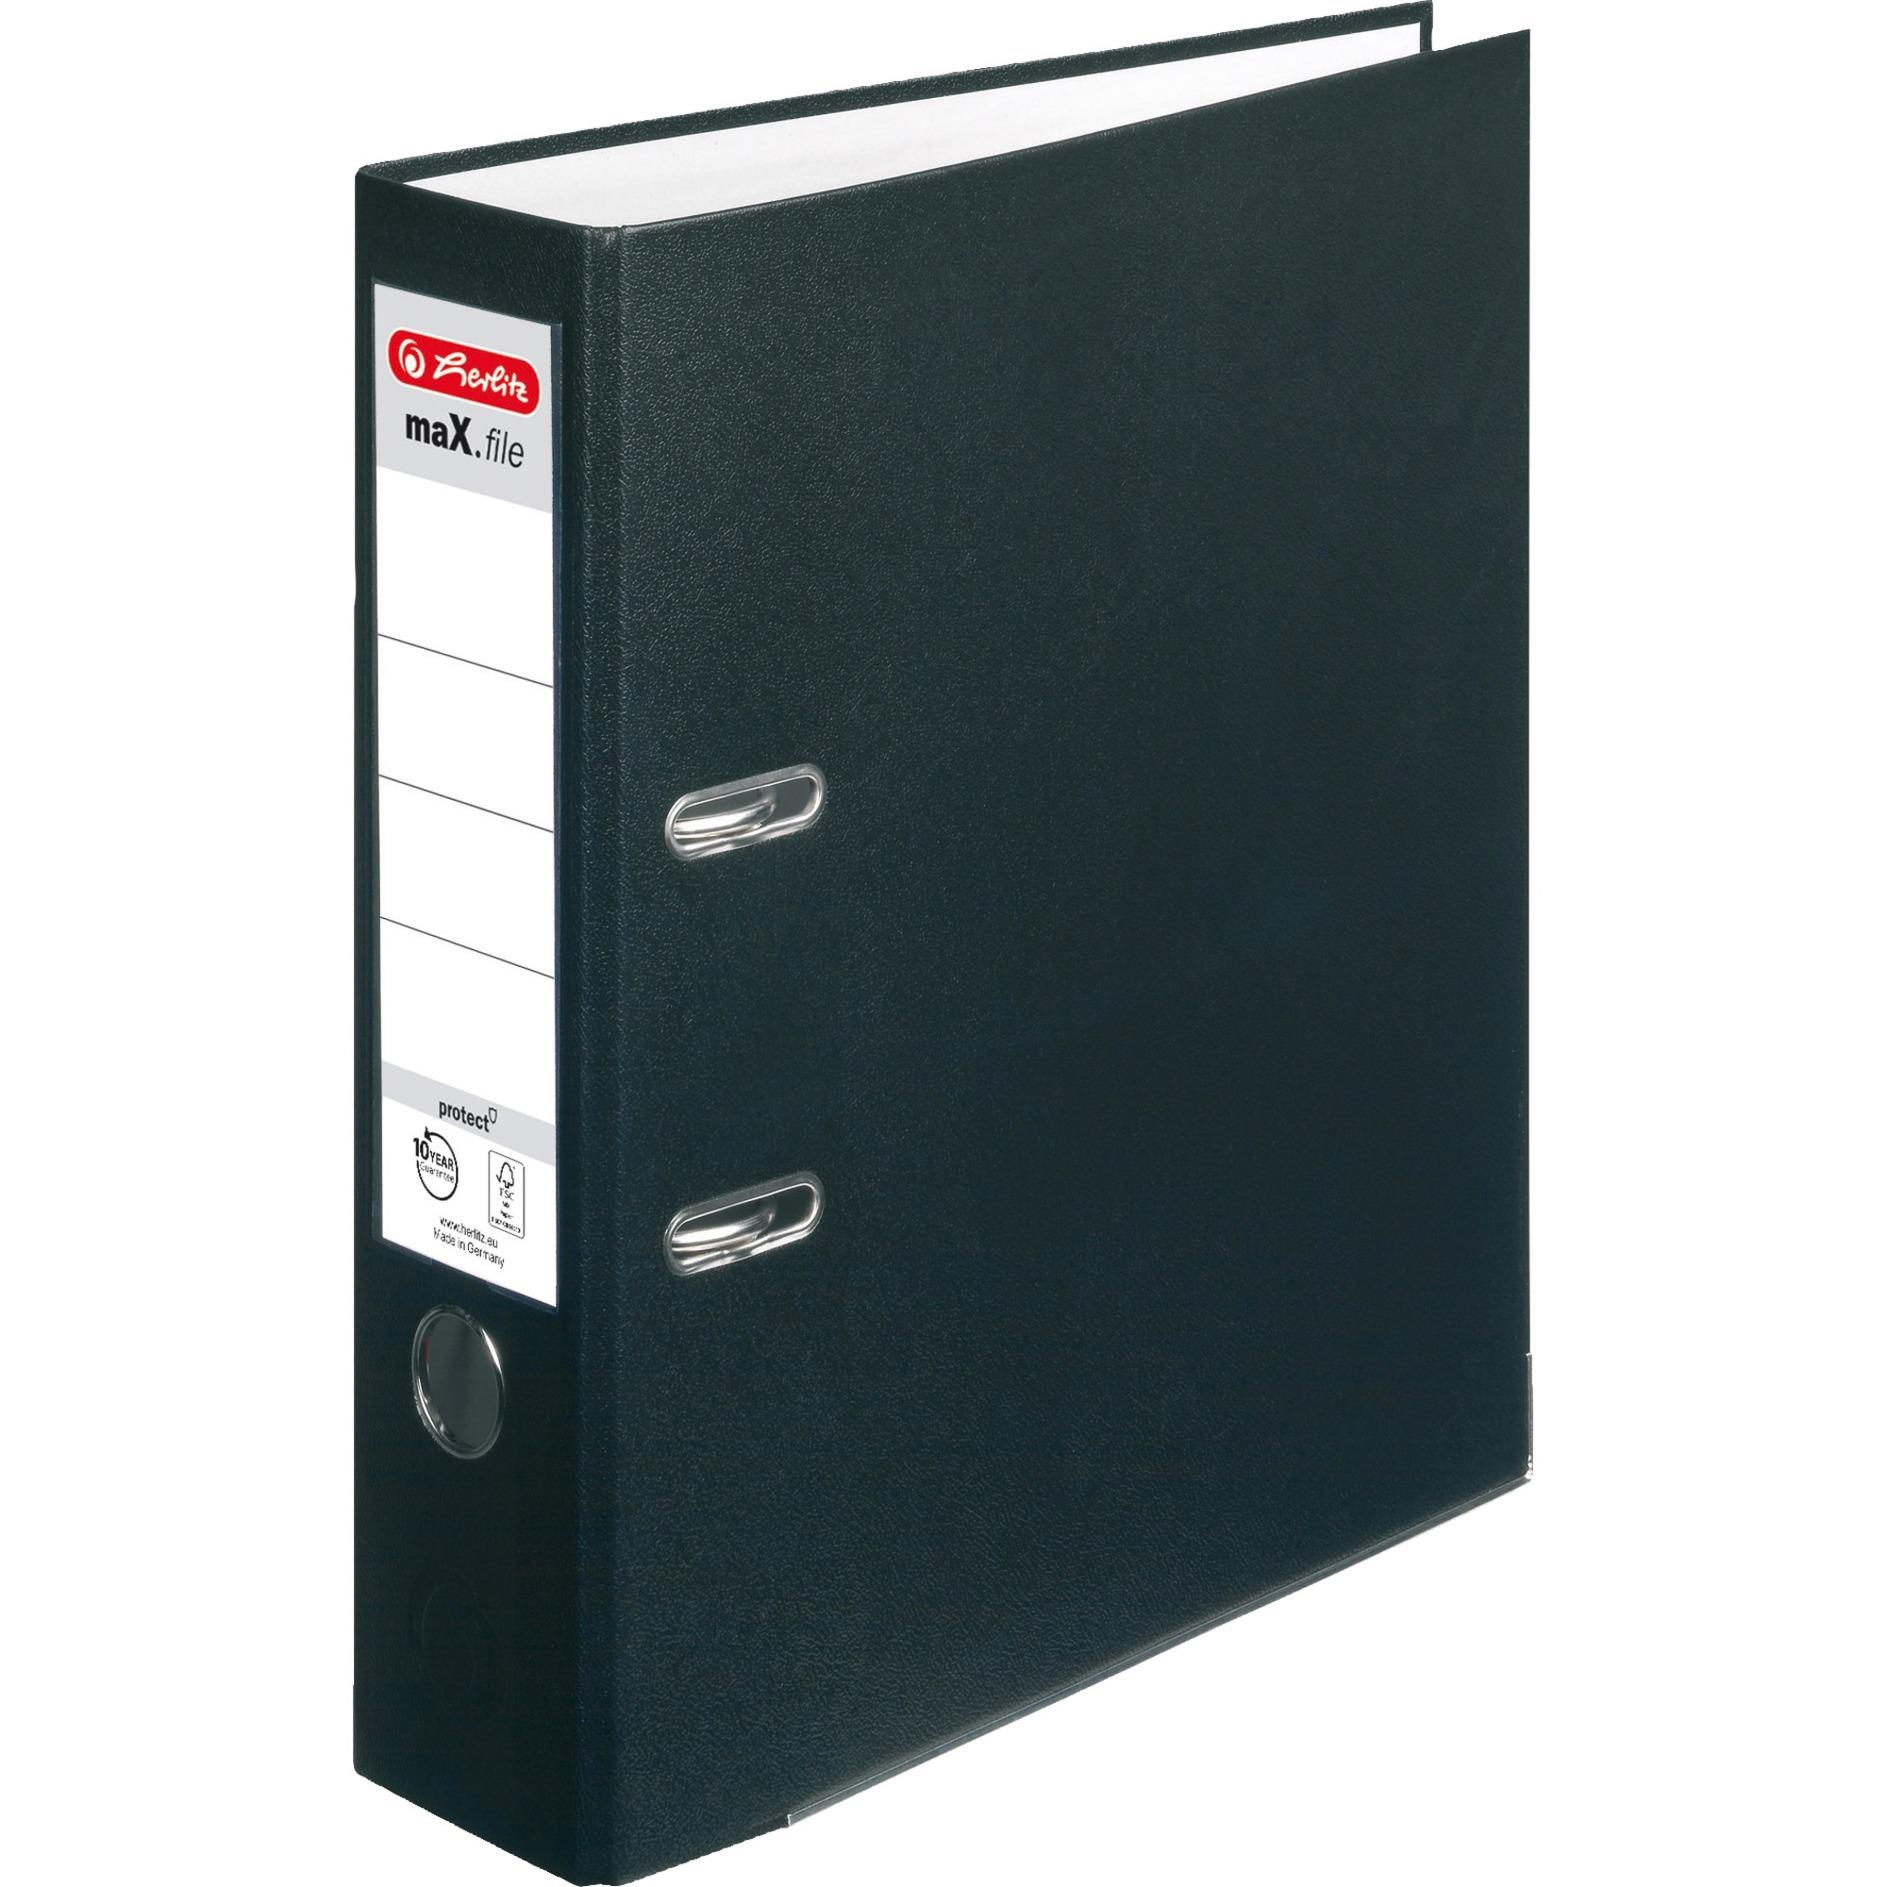 5480801 Noir fichier, Dossier